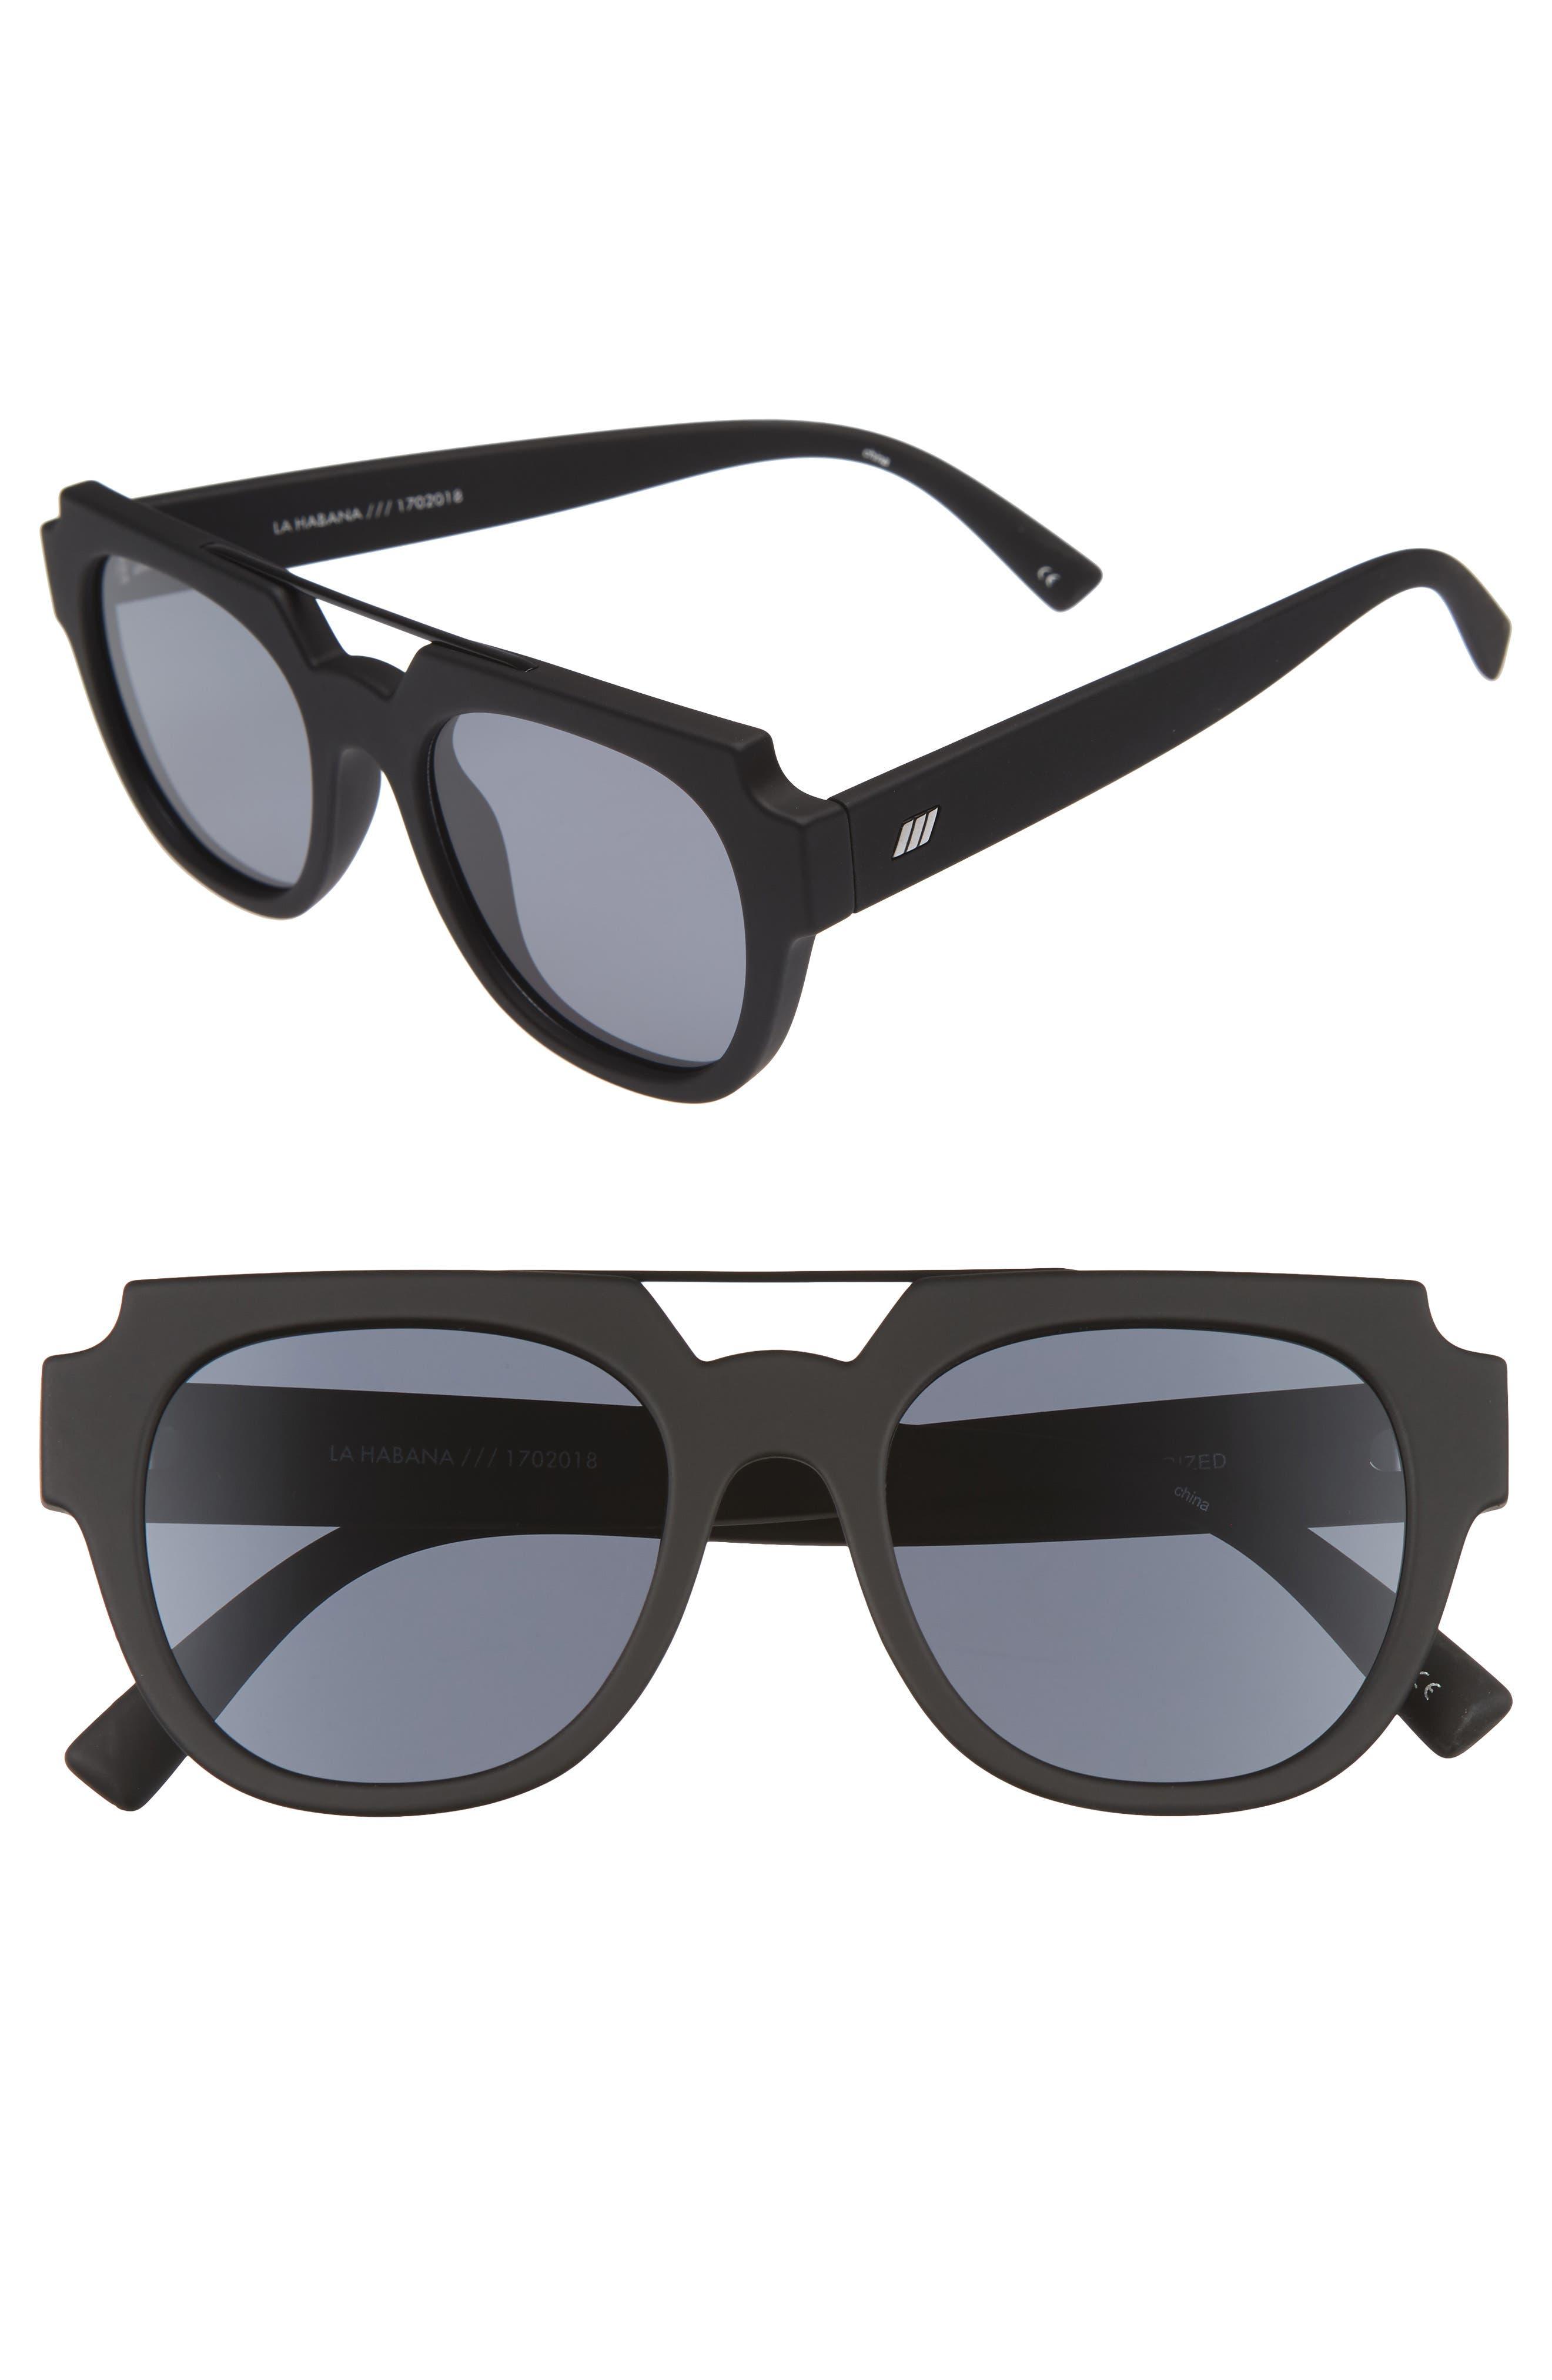 La Habana 52mm Retro Sunglasses,                         Main,                         color, 001